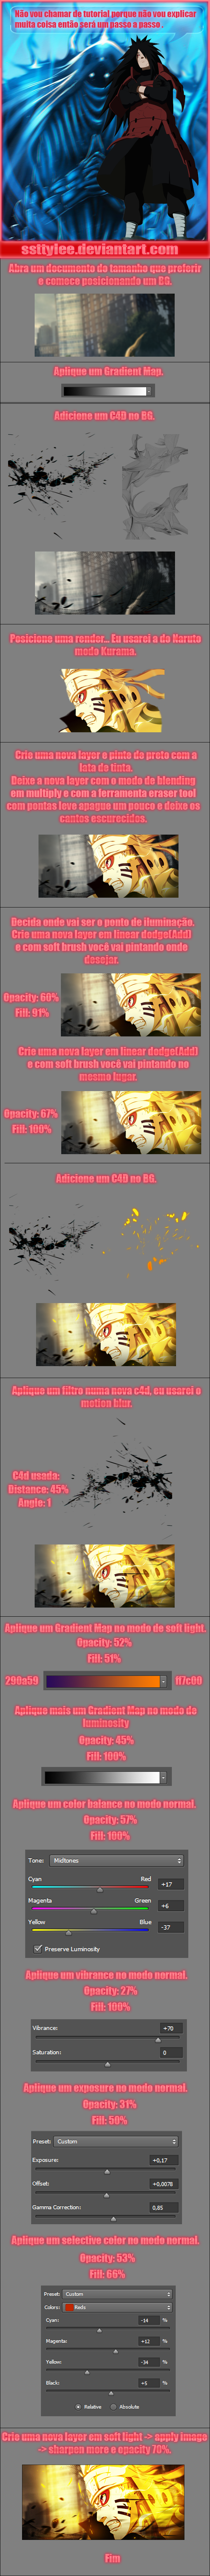 Tutoriais - Fou-Lu Naruto___tutorial_by_ssttylee-d7irb1m